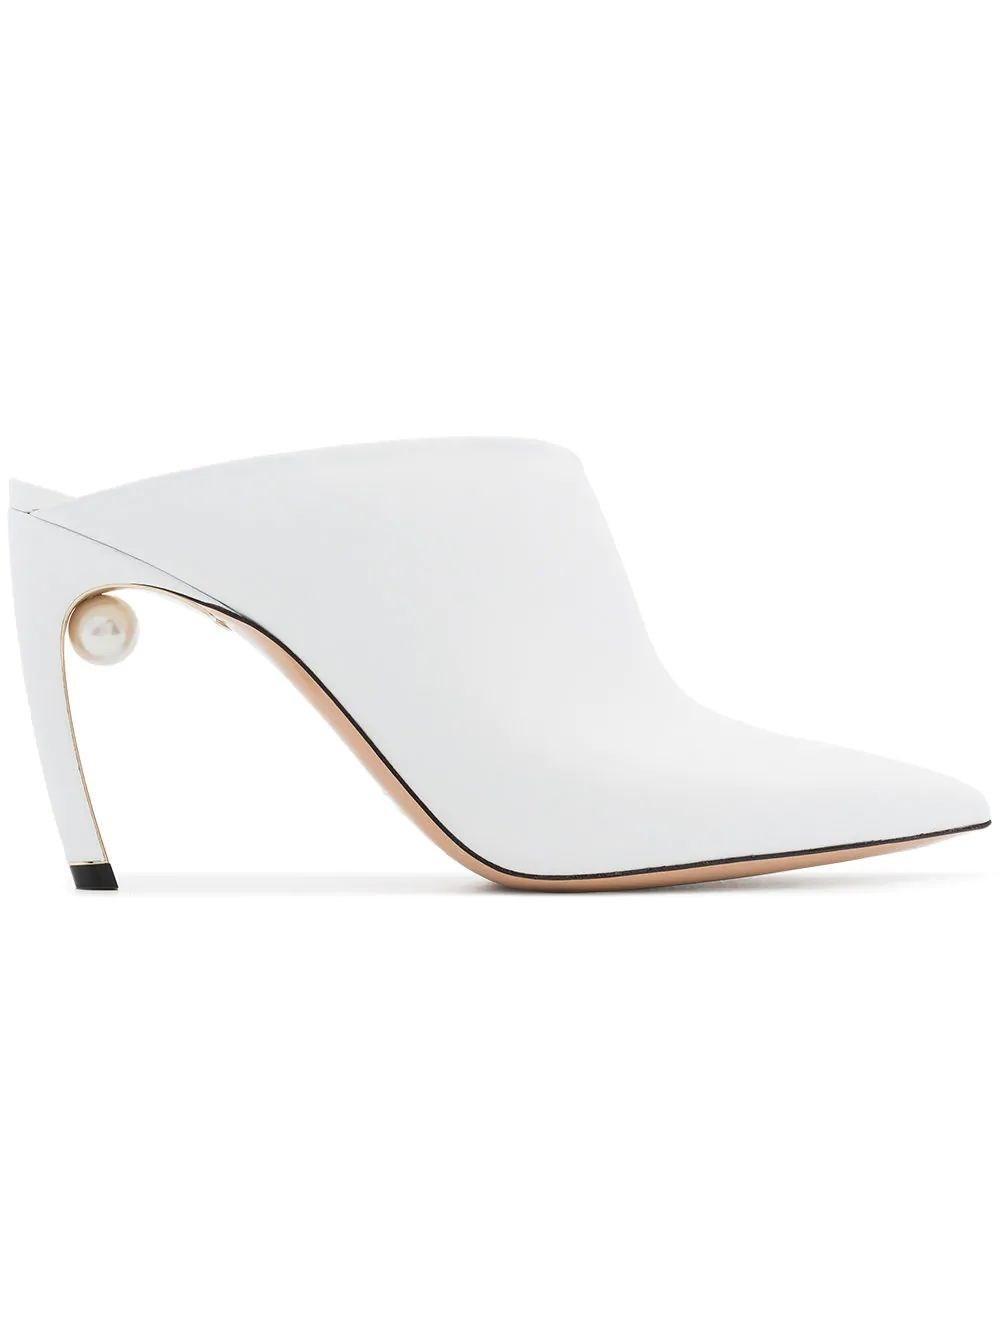 a8a9fc185a0 Lyst - Nicholas Kirkwood Women s 909a51vls4w01 White Leather Heels ...